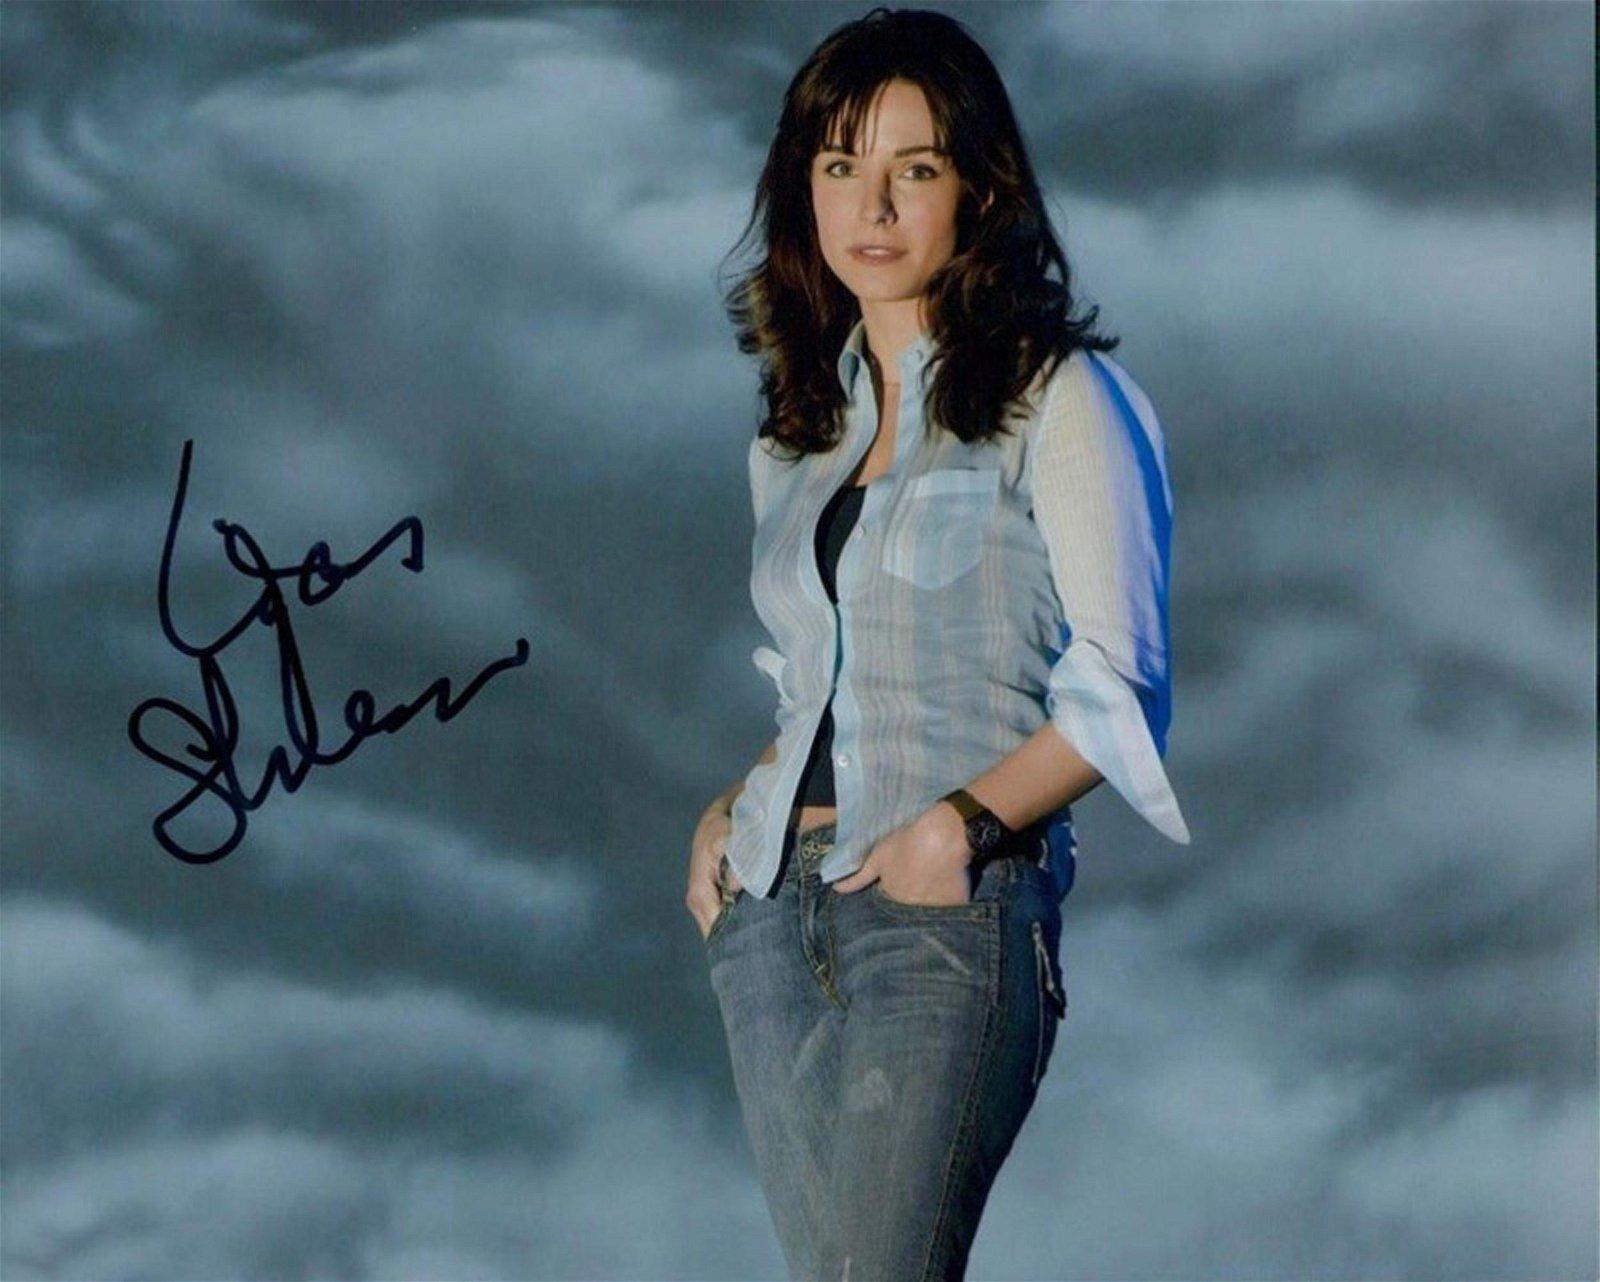 Blowout Sale! Invasion Lisa Sheridan hand signed 10x8